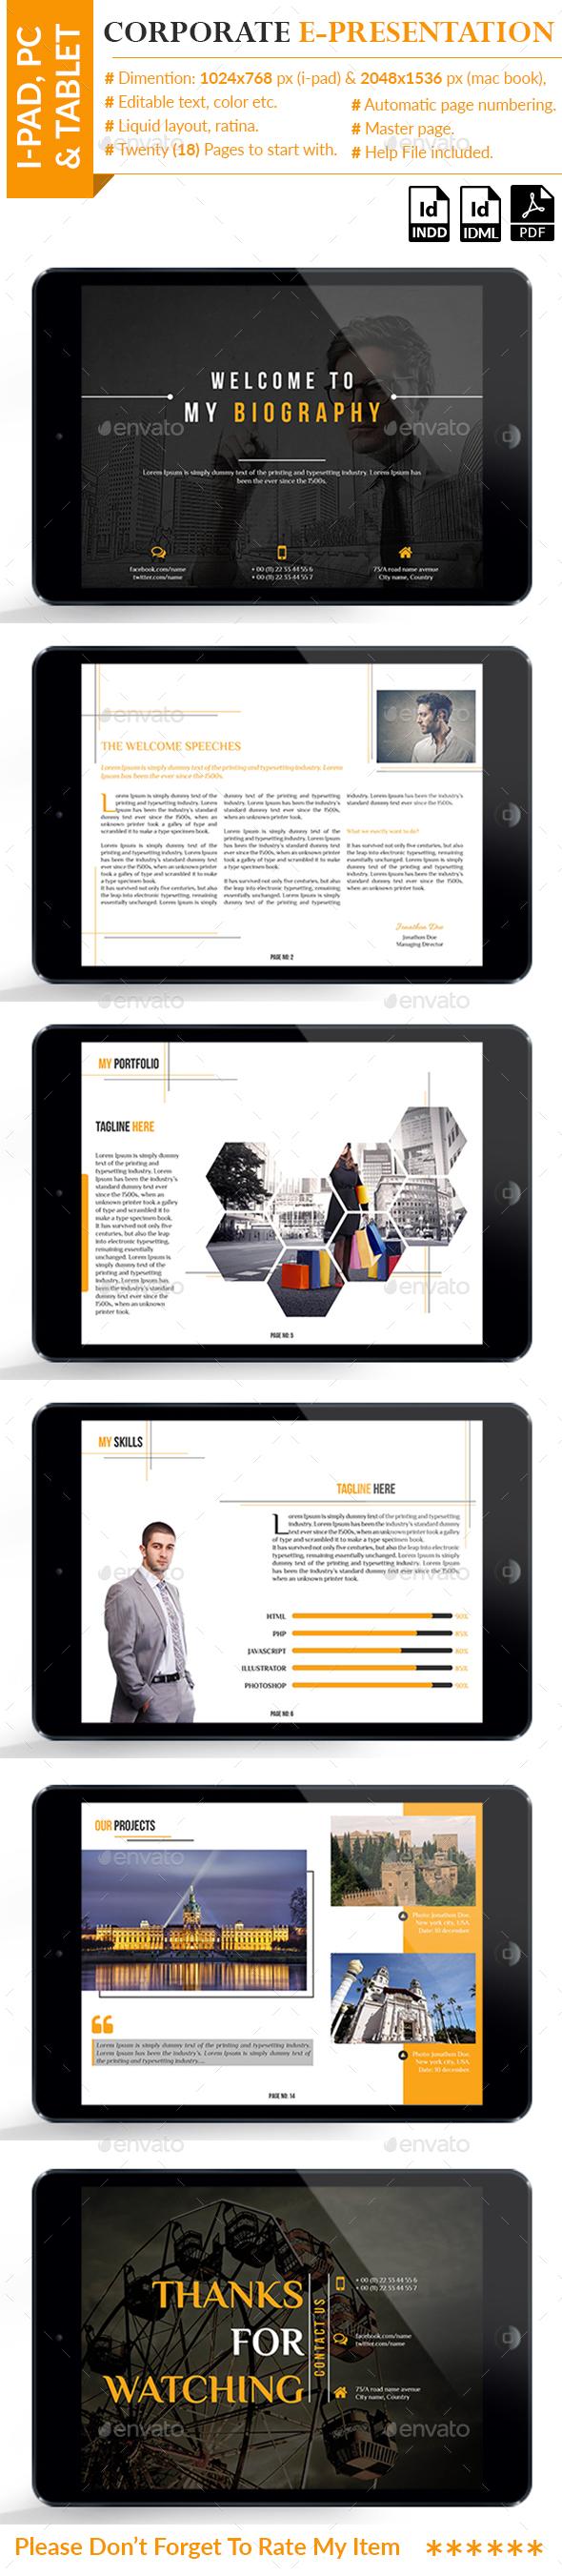 Corporate E-Presentation - ePublishing